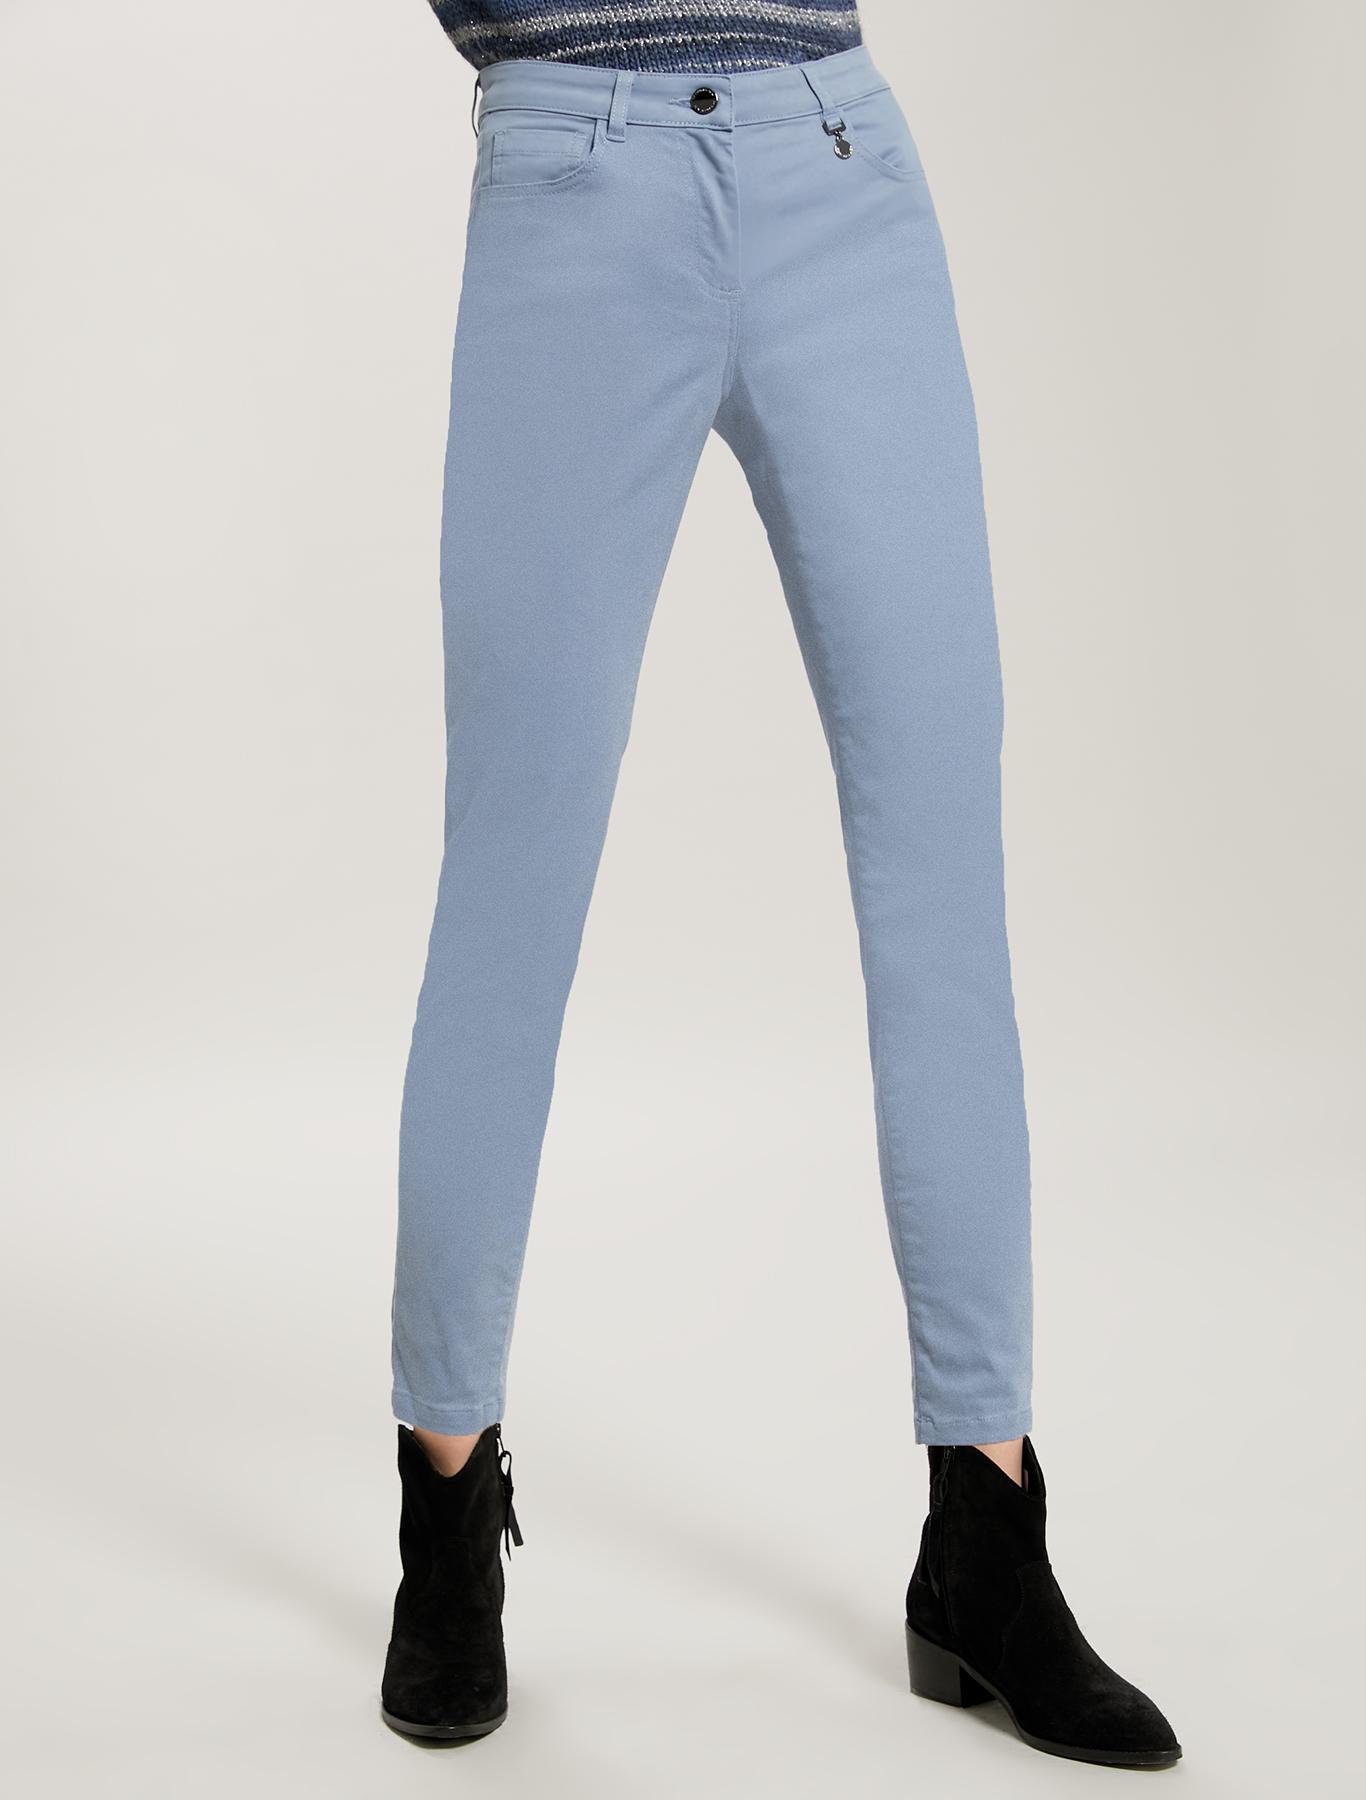 Skinny cotton satin trousers - light blue - pennyblack